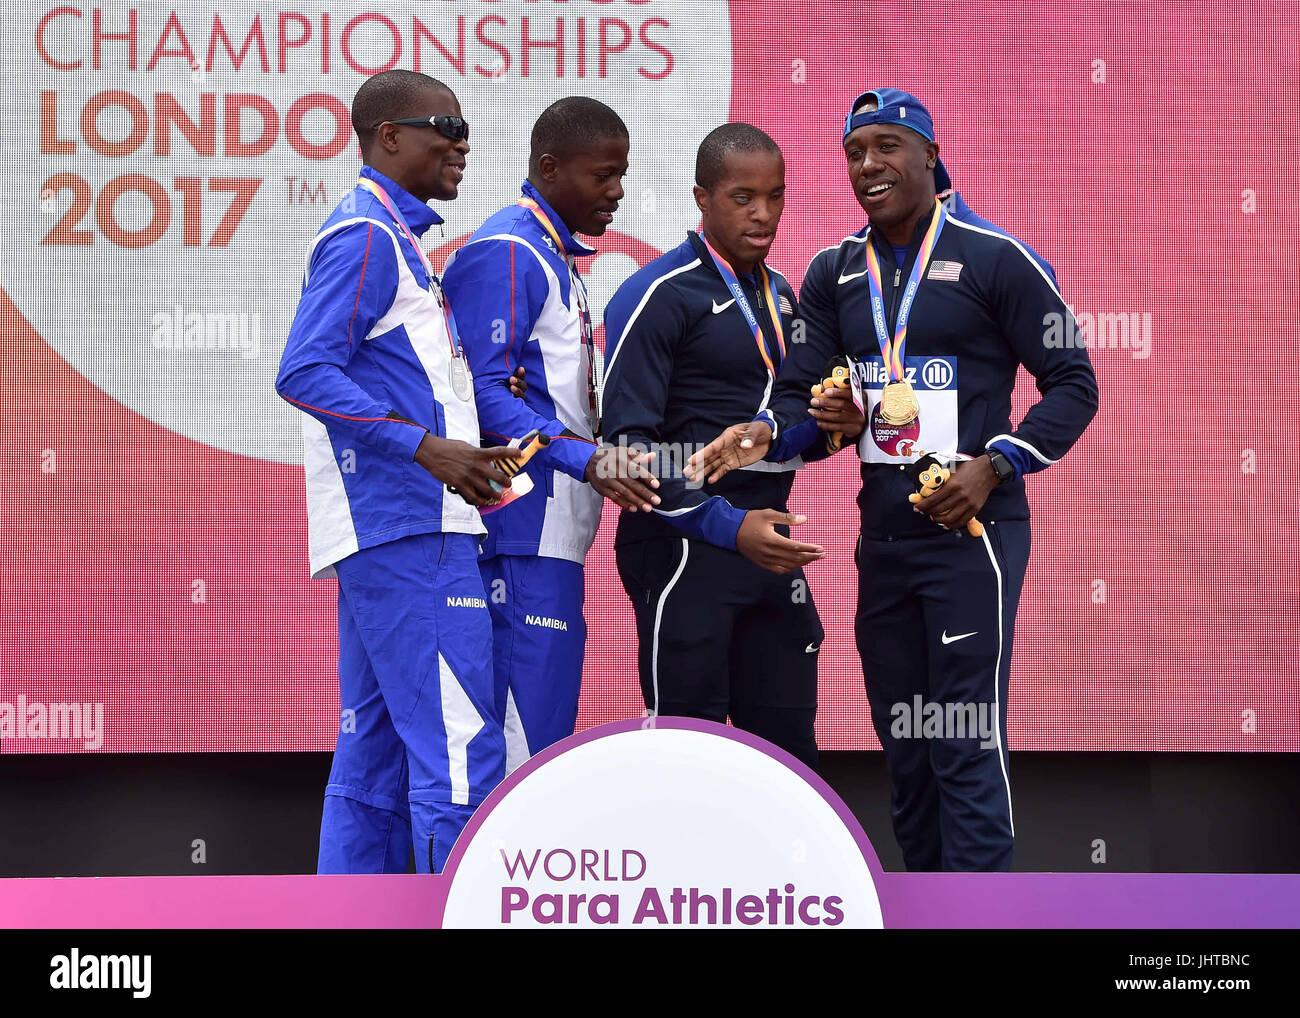 London, UK. 16th July, 2017. at Victory Ceremonies during World Para Athletics, Championships London 2017,  at London - Stock Image